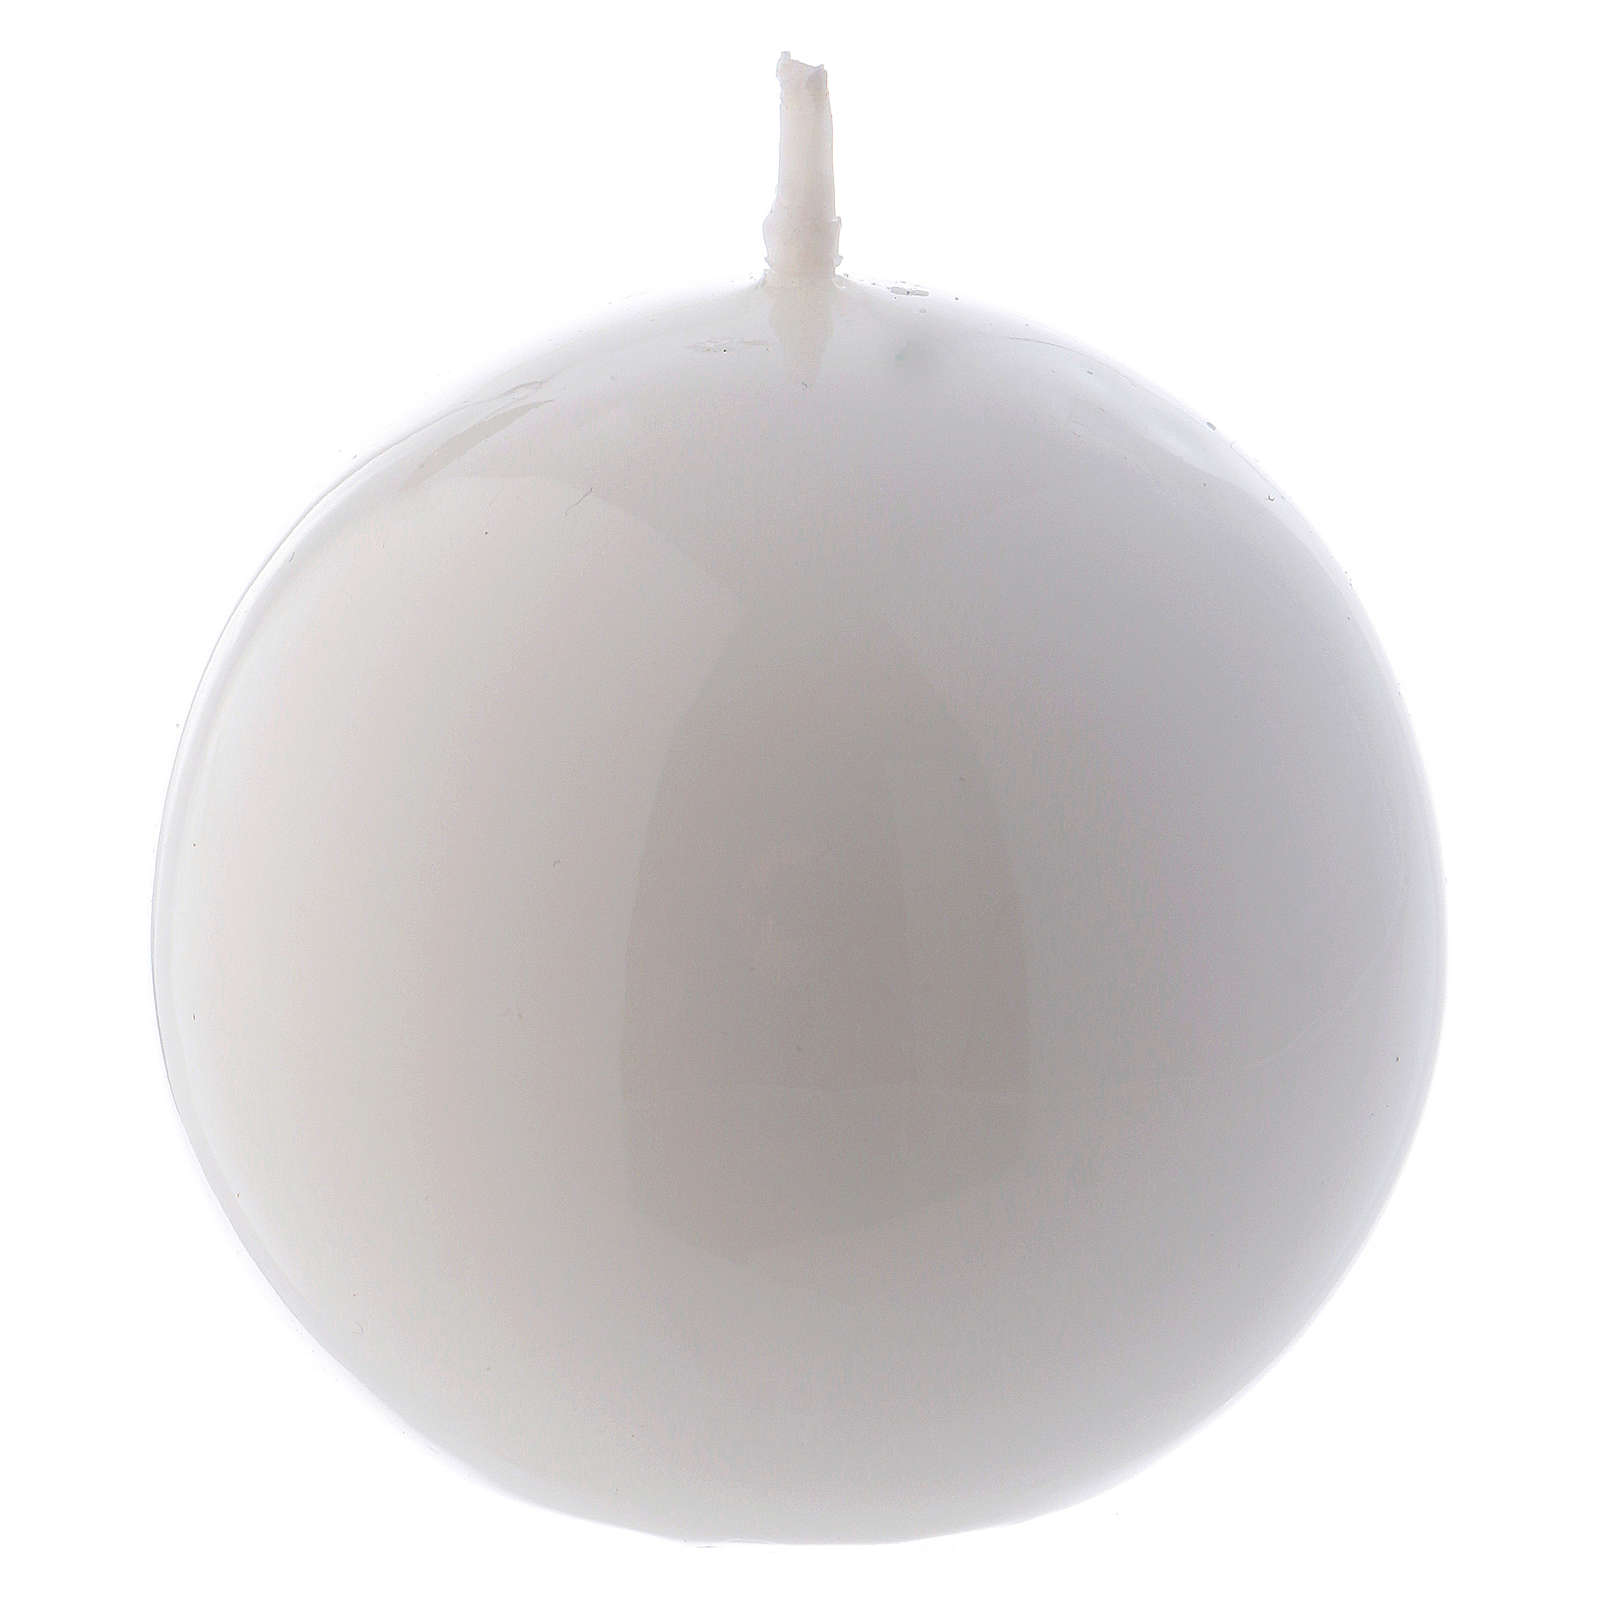 Vela Esfera Lúcida Lacre d. 6 cm blanca 3